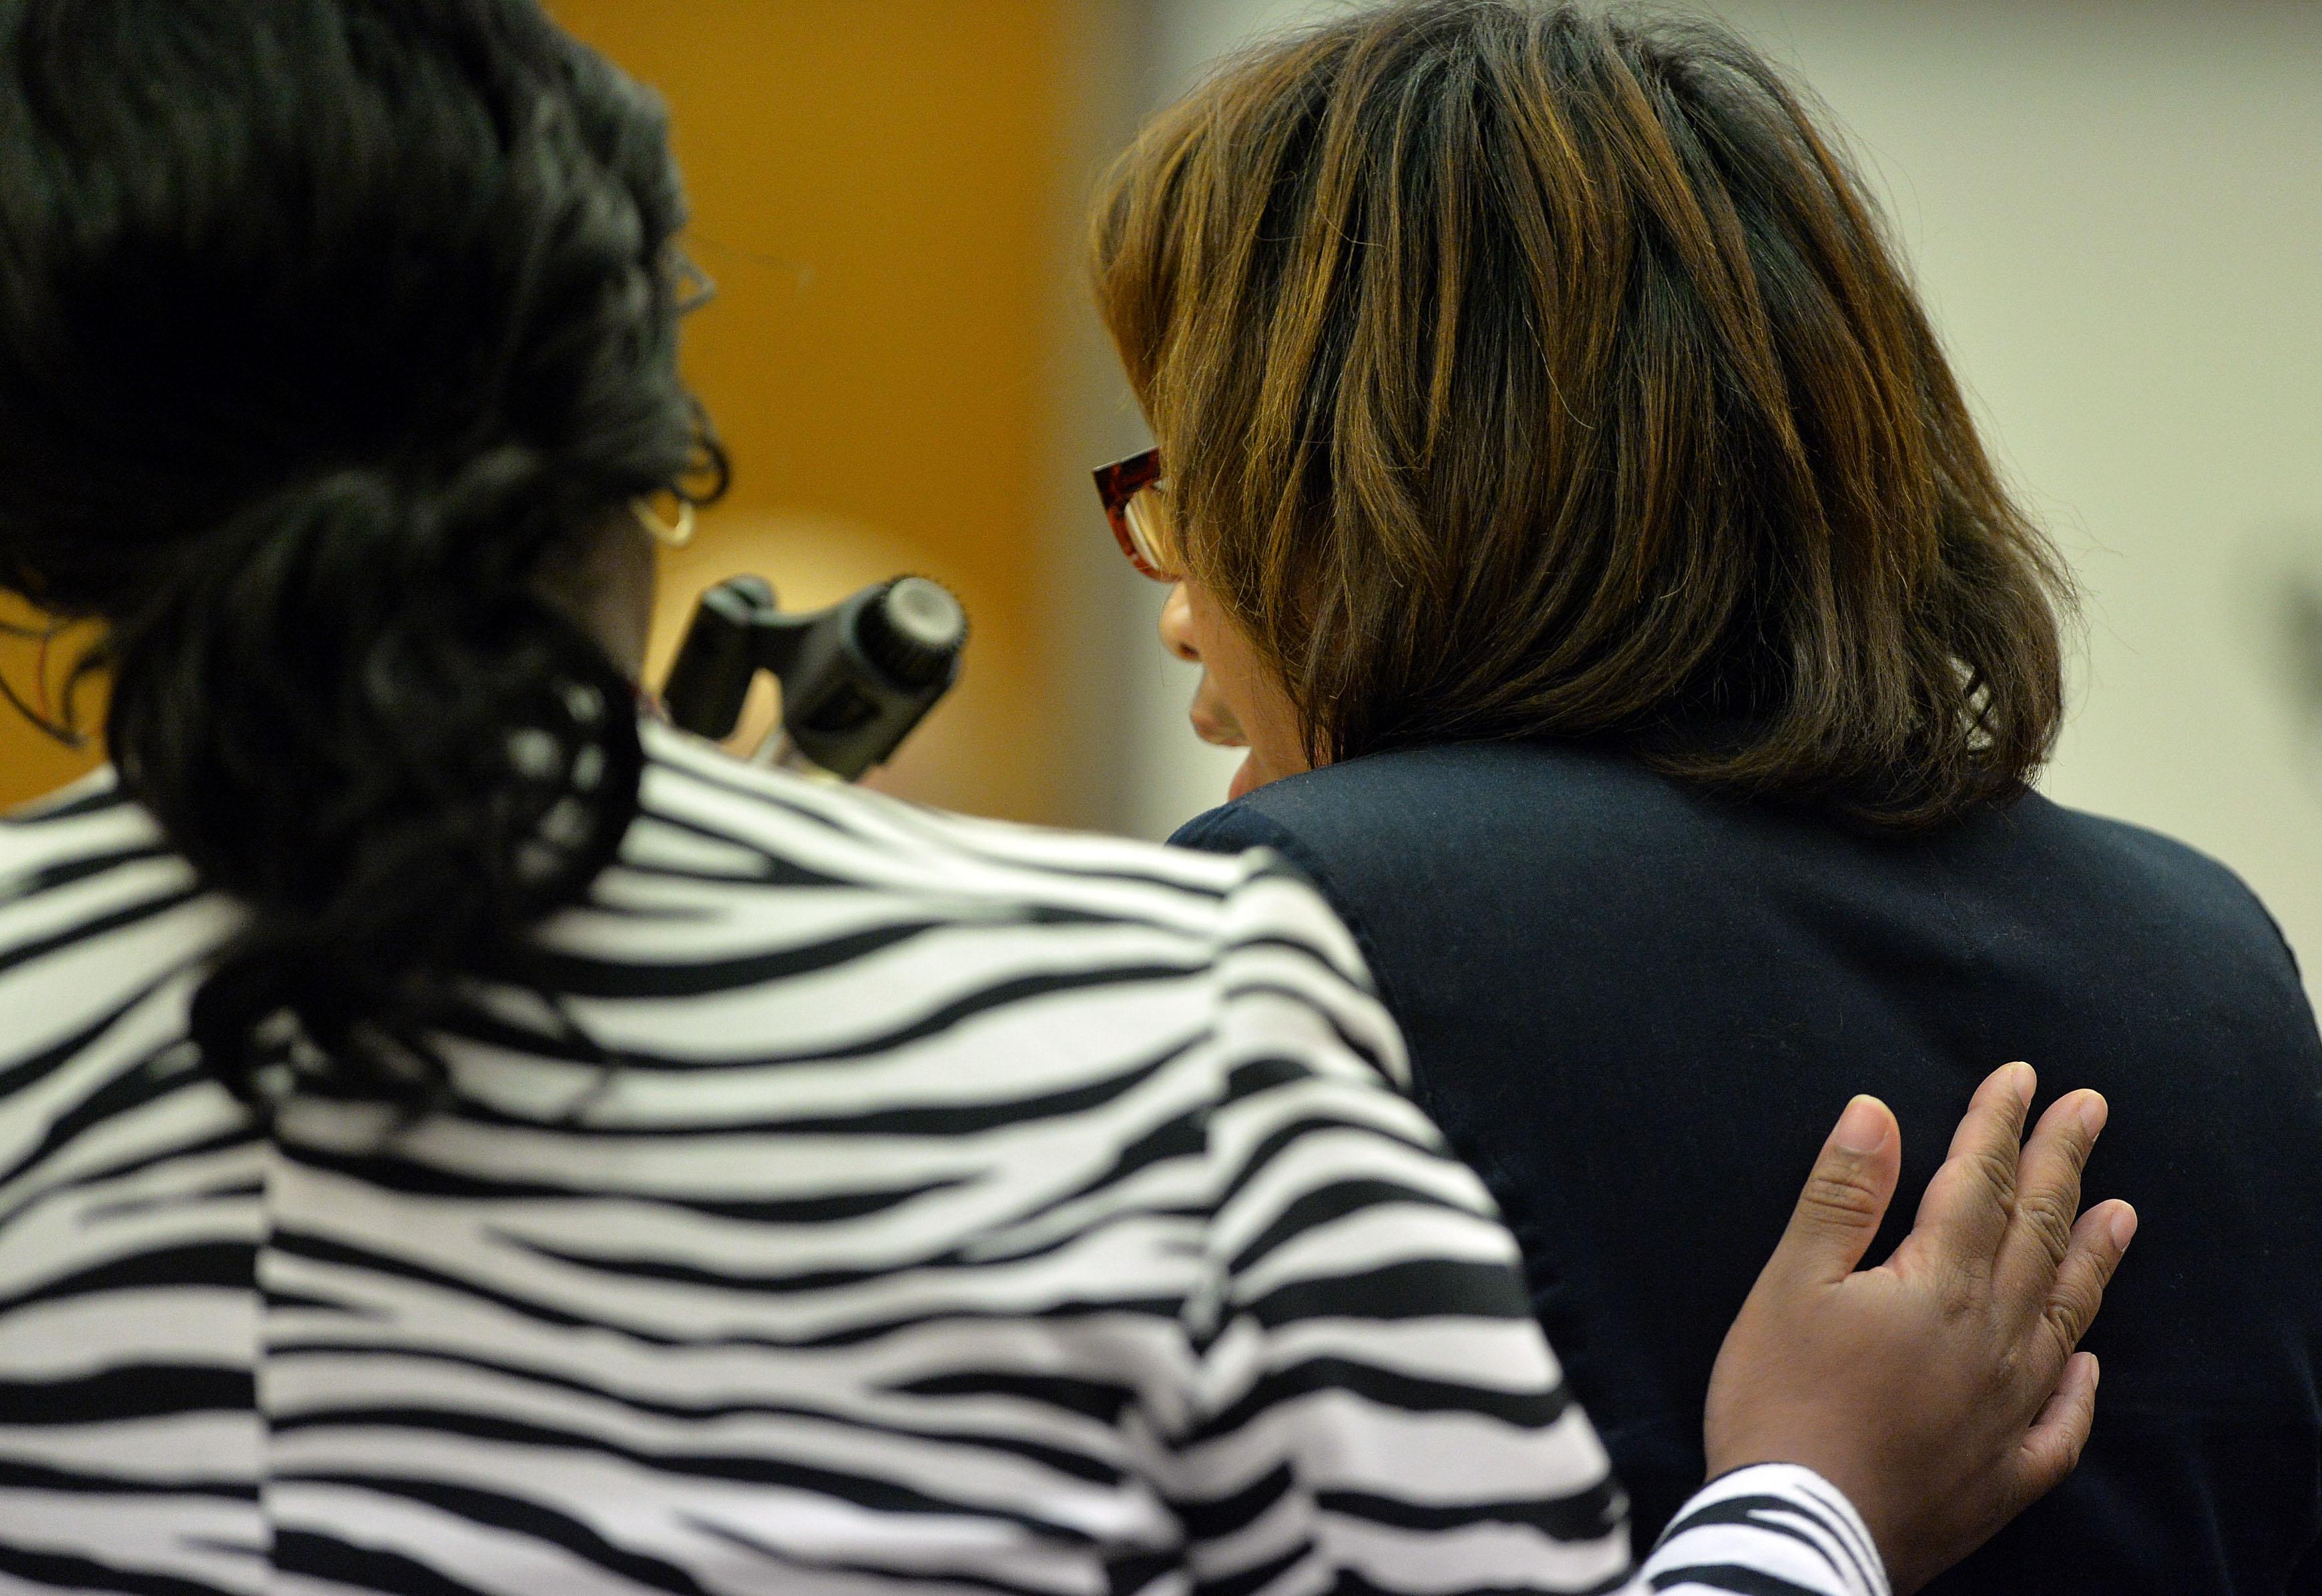 Cheating Case In Atlanta : Atlanta educator found not guilty in cheating case